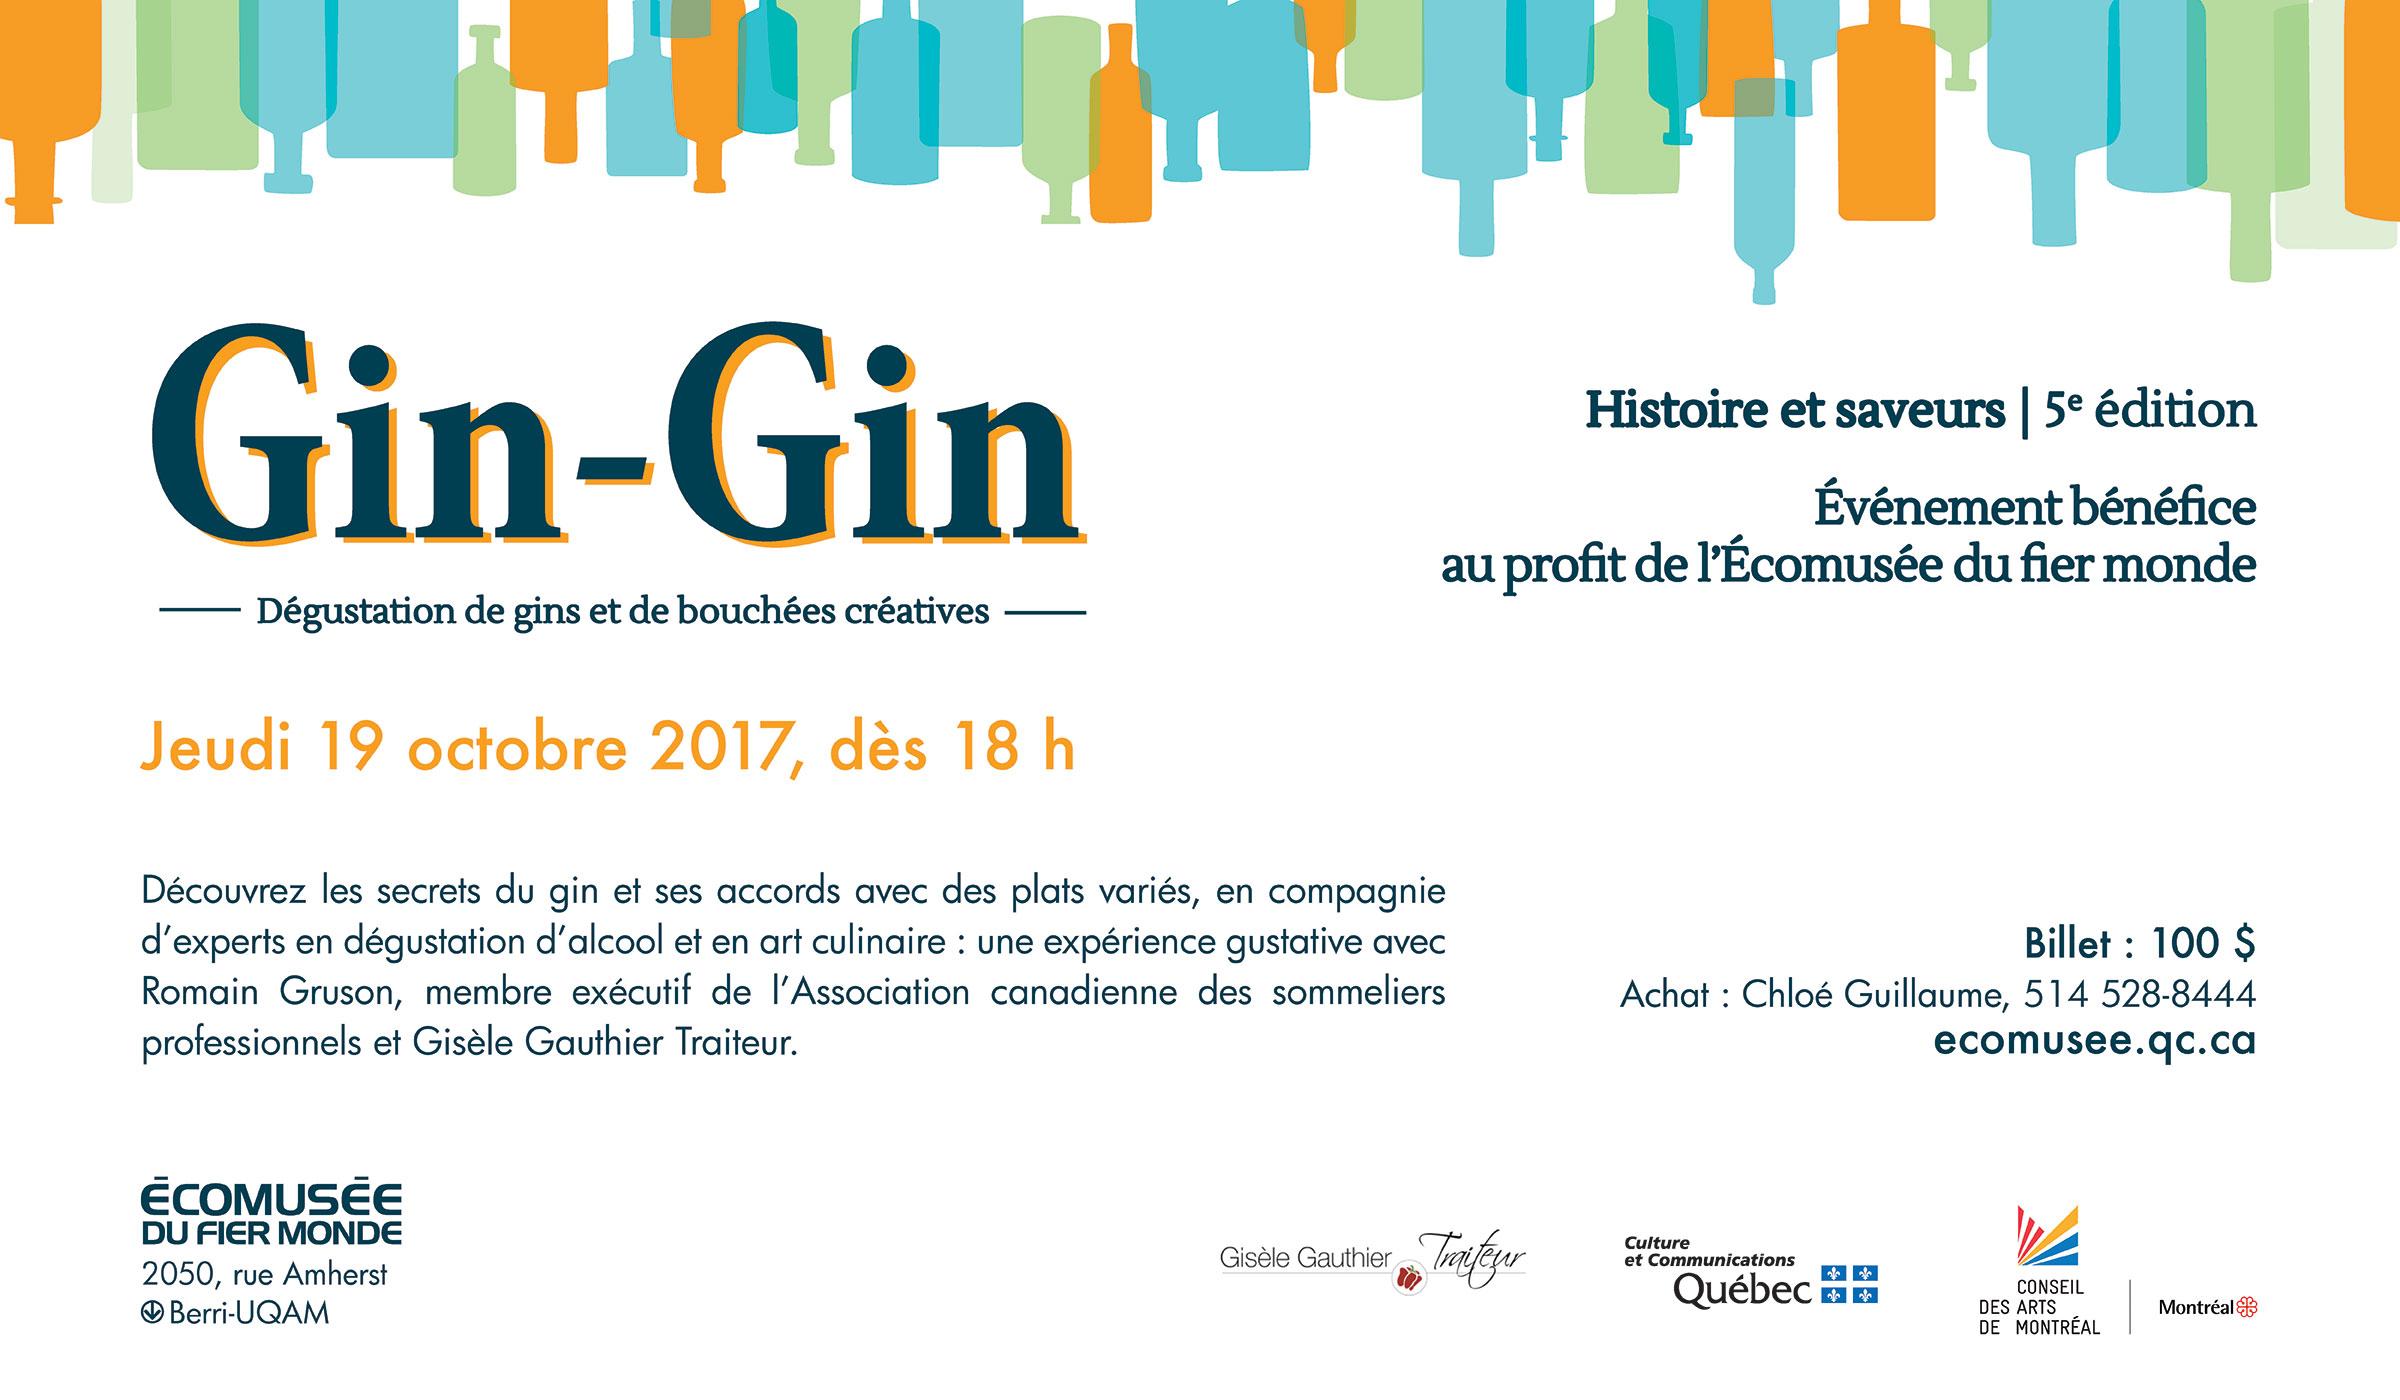 gingin_invitation-virtuelle